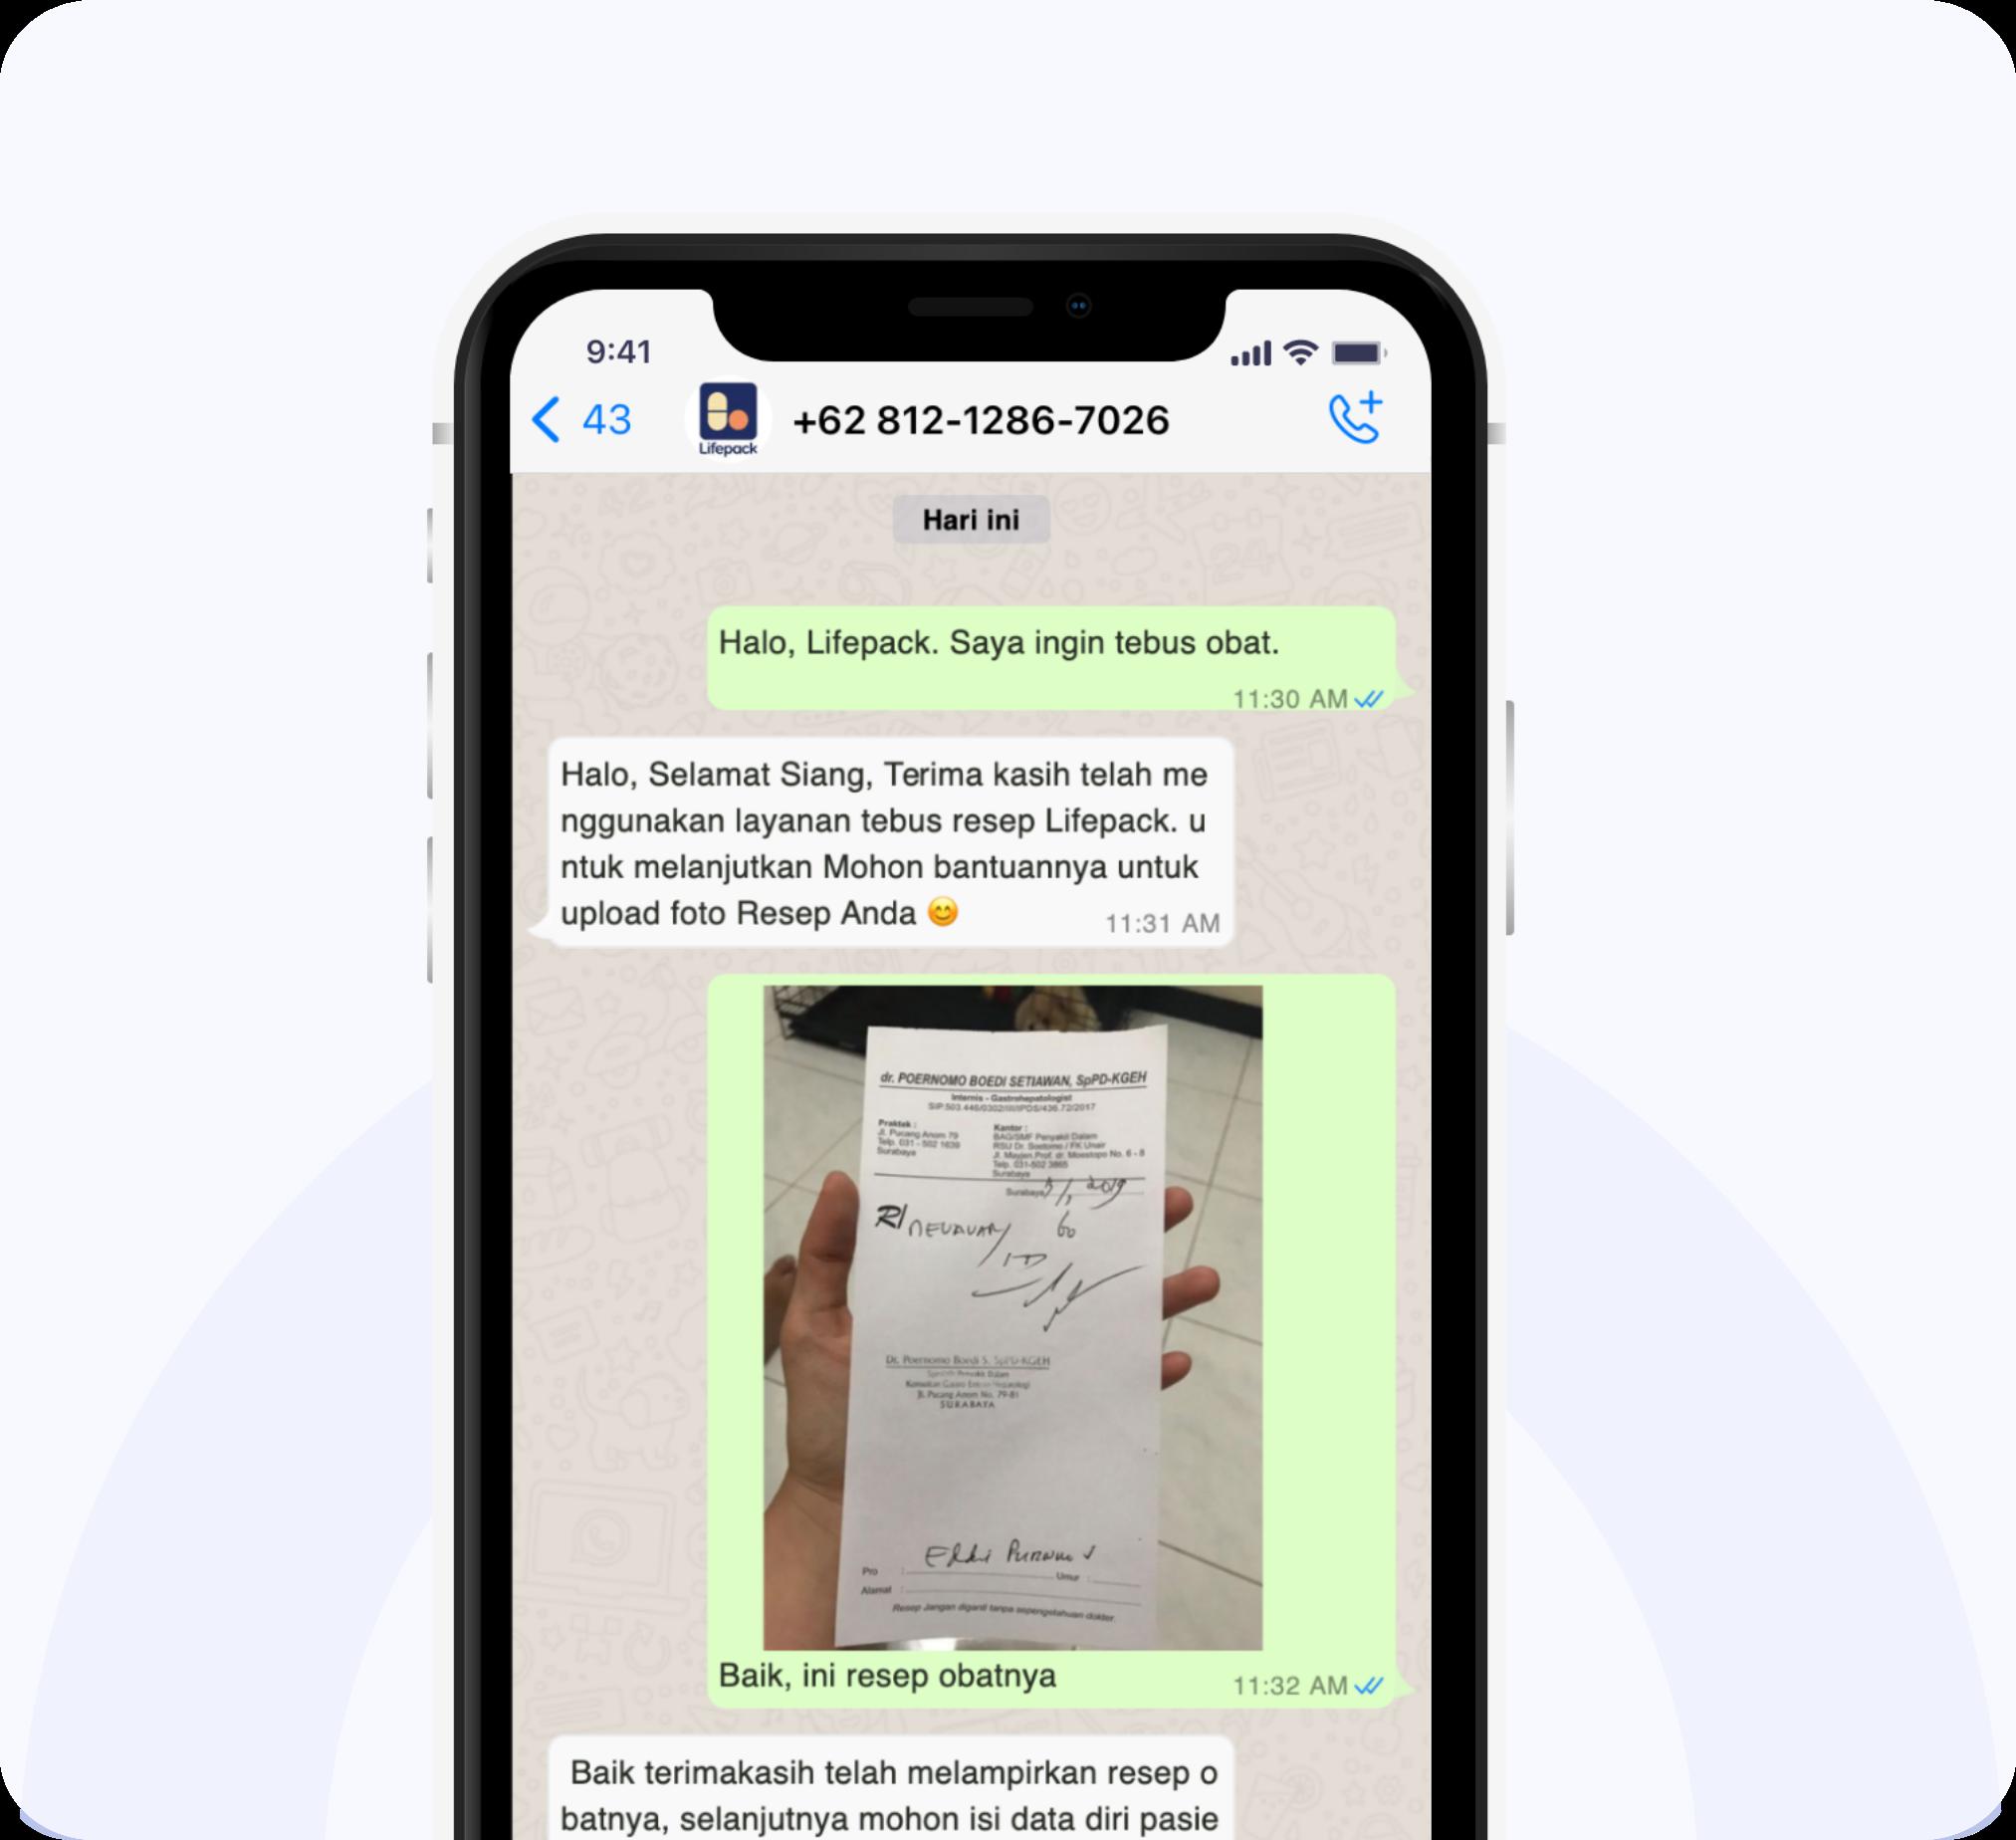 Tata Cara Tebus Obat Via Whatsapp Step 3